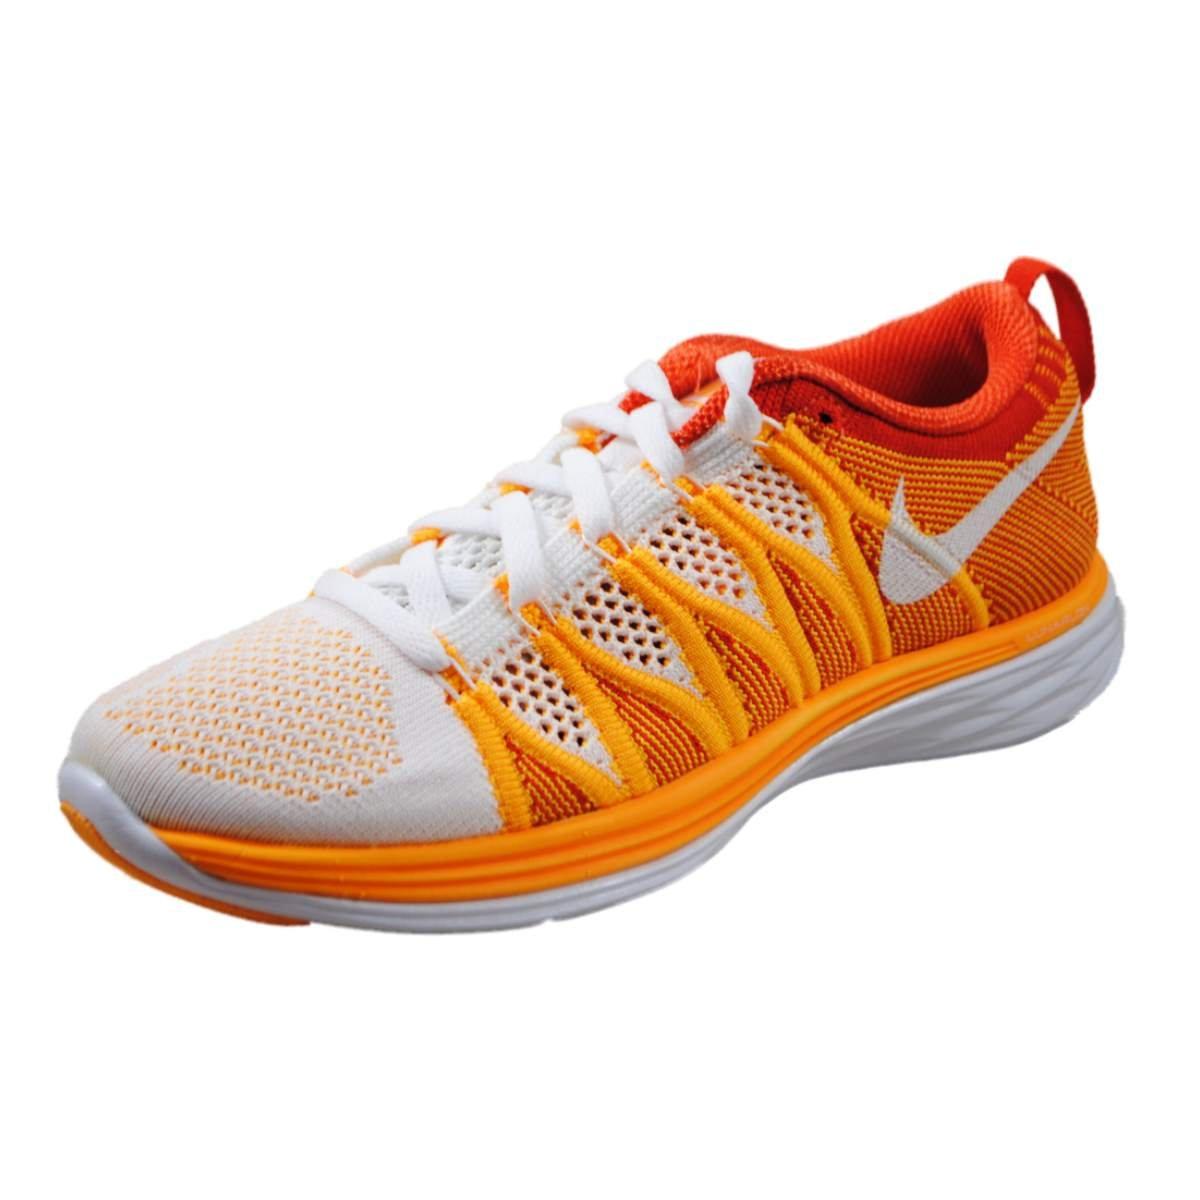 NIKE 620465 601 - Zapatillas de correr de material sintético hombre 38.5 EU|white laser orange team orange 101